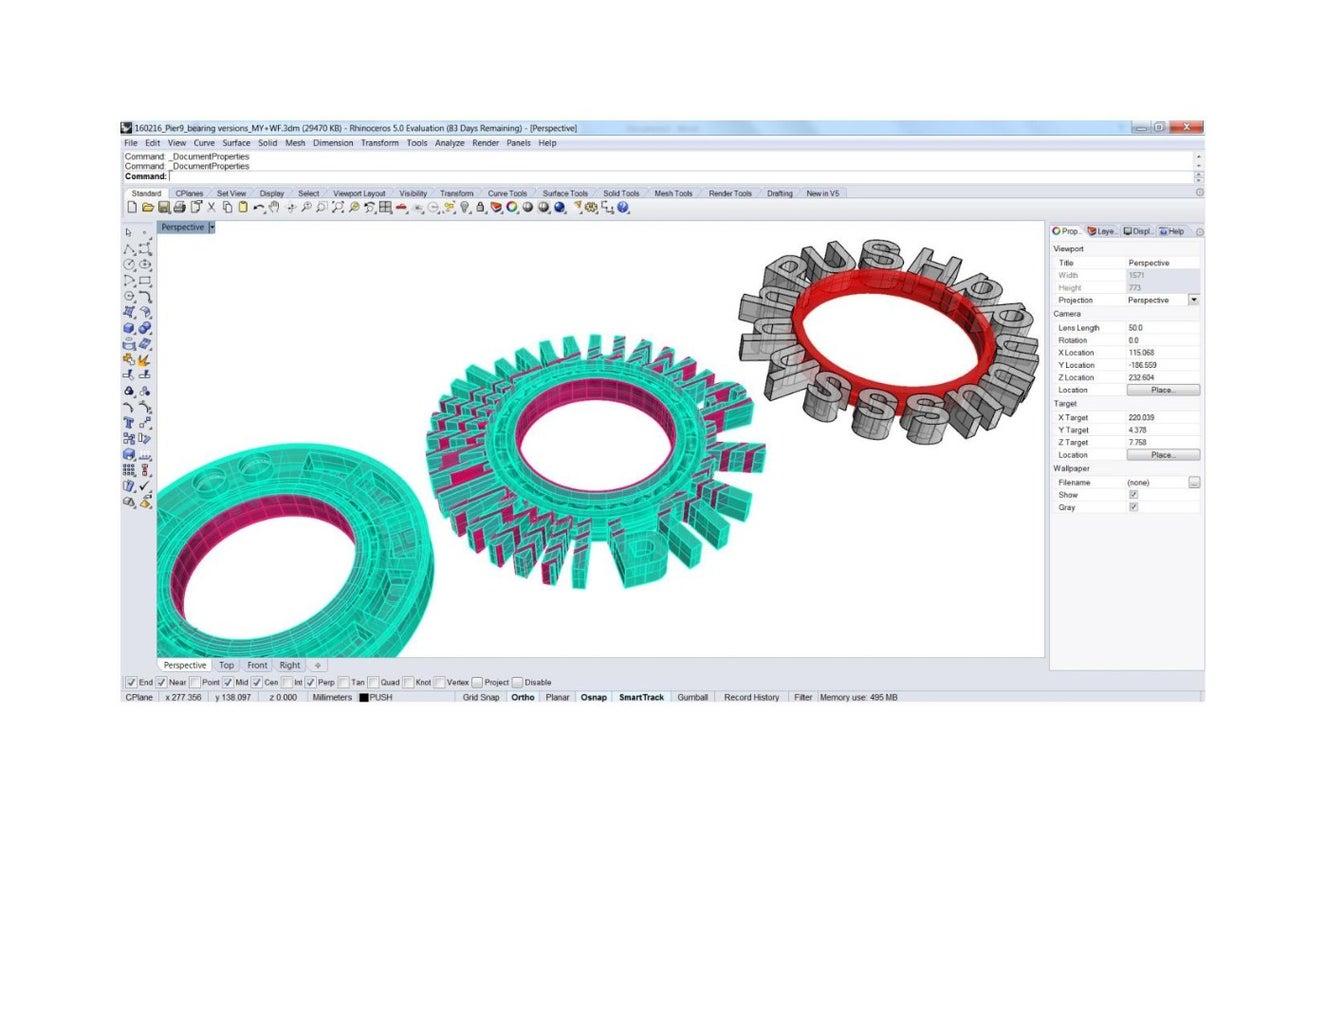 Iteration #2 - Generating 3D Printable Files From Adobe Illustrator / Rhino3D / AutoDesk Fusion 360